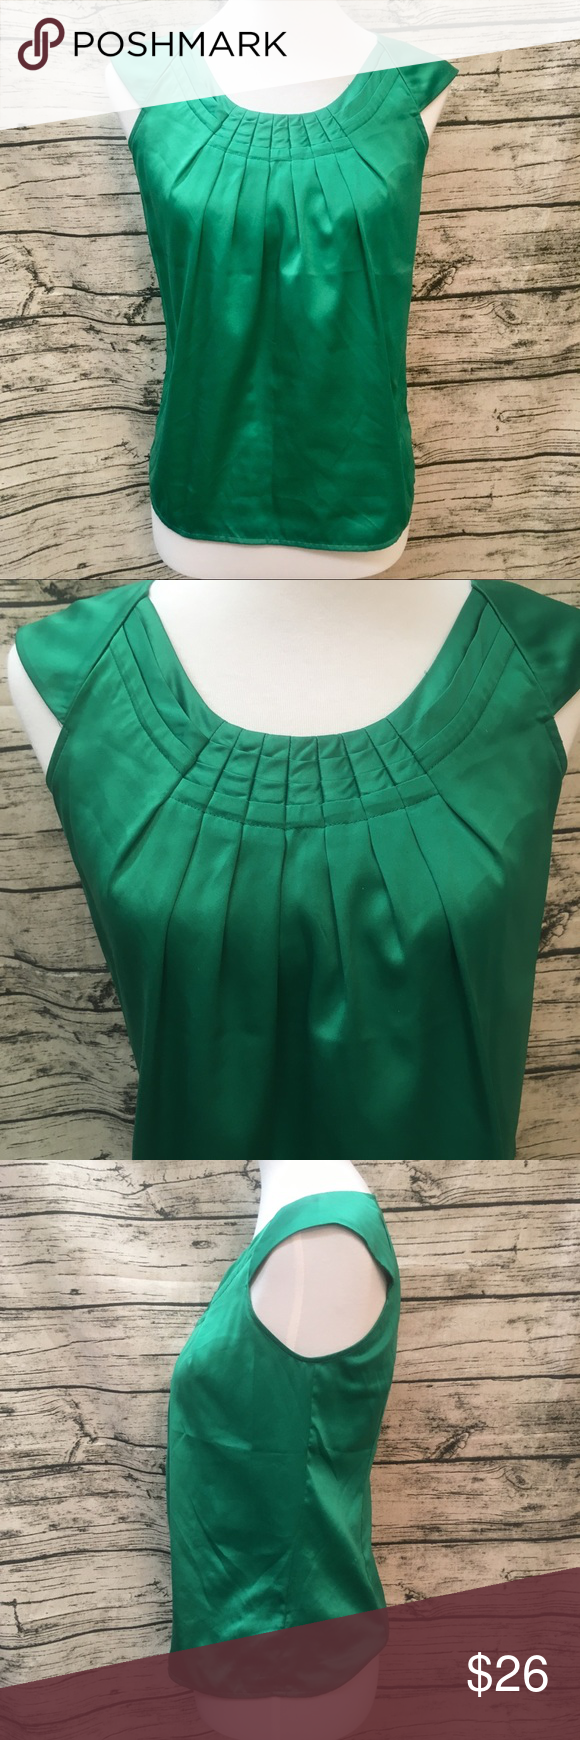 69a06ca6ce1 Plus Size Tops - Womens Plus Size Blouses   Shirts - Macy s